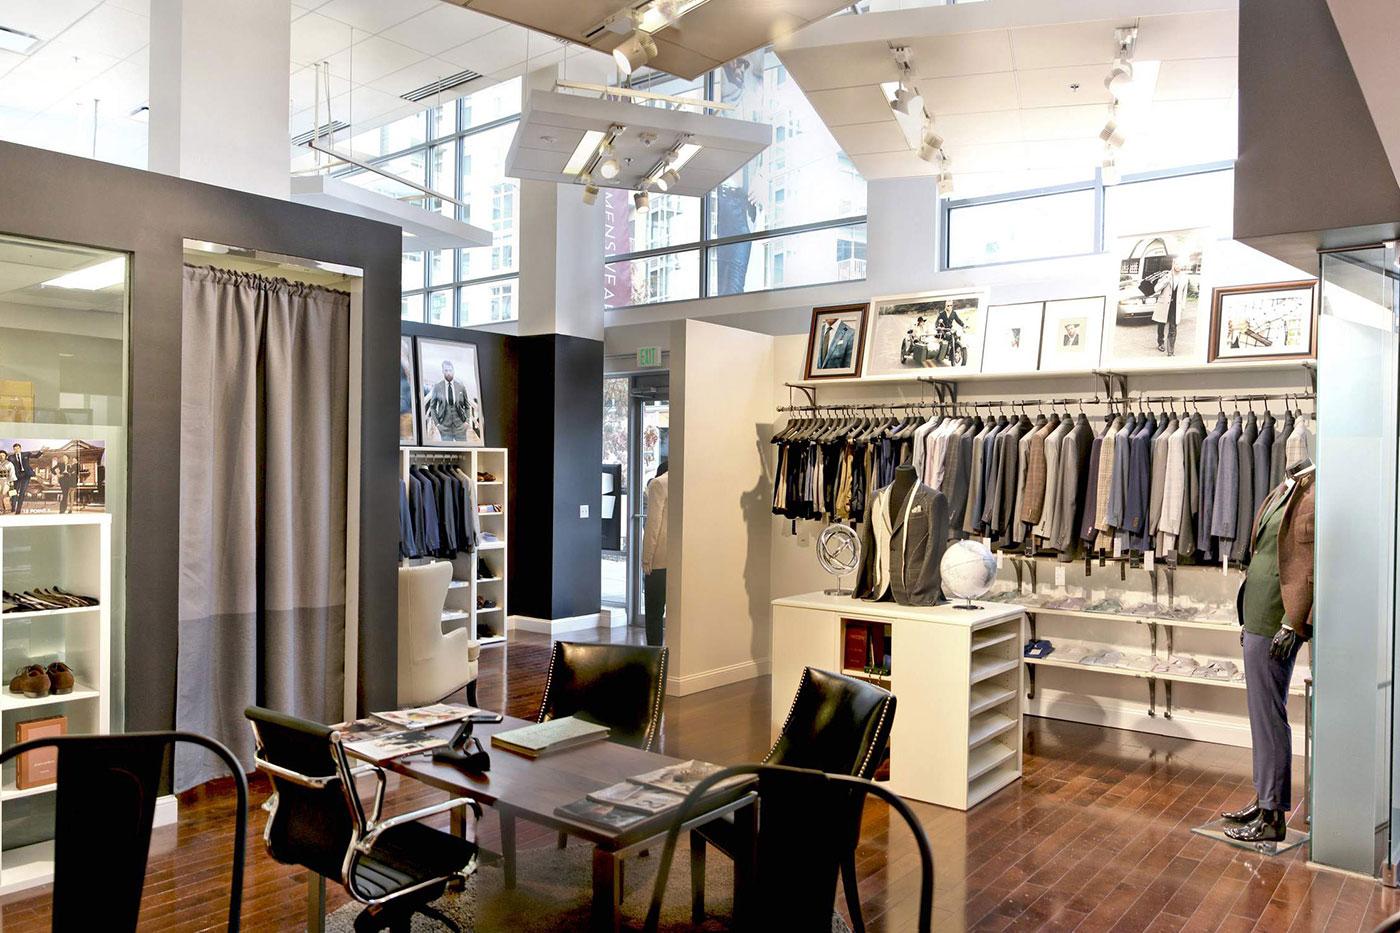 Knot Standard's showroom in Washington, D.C.